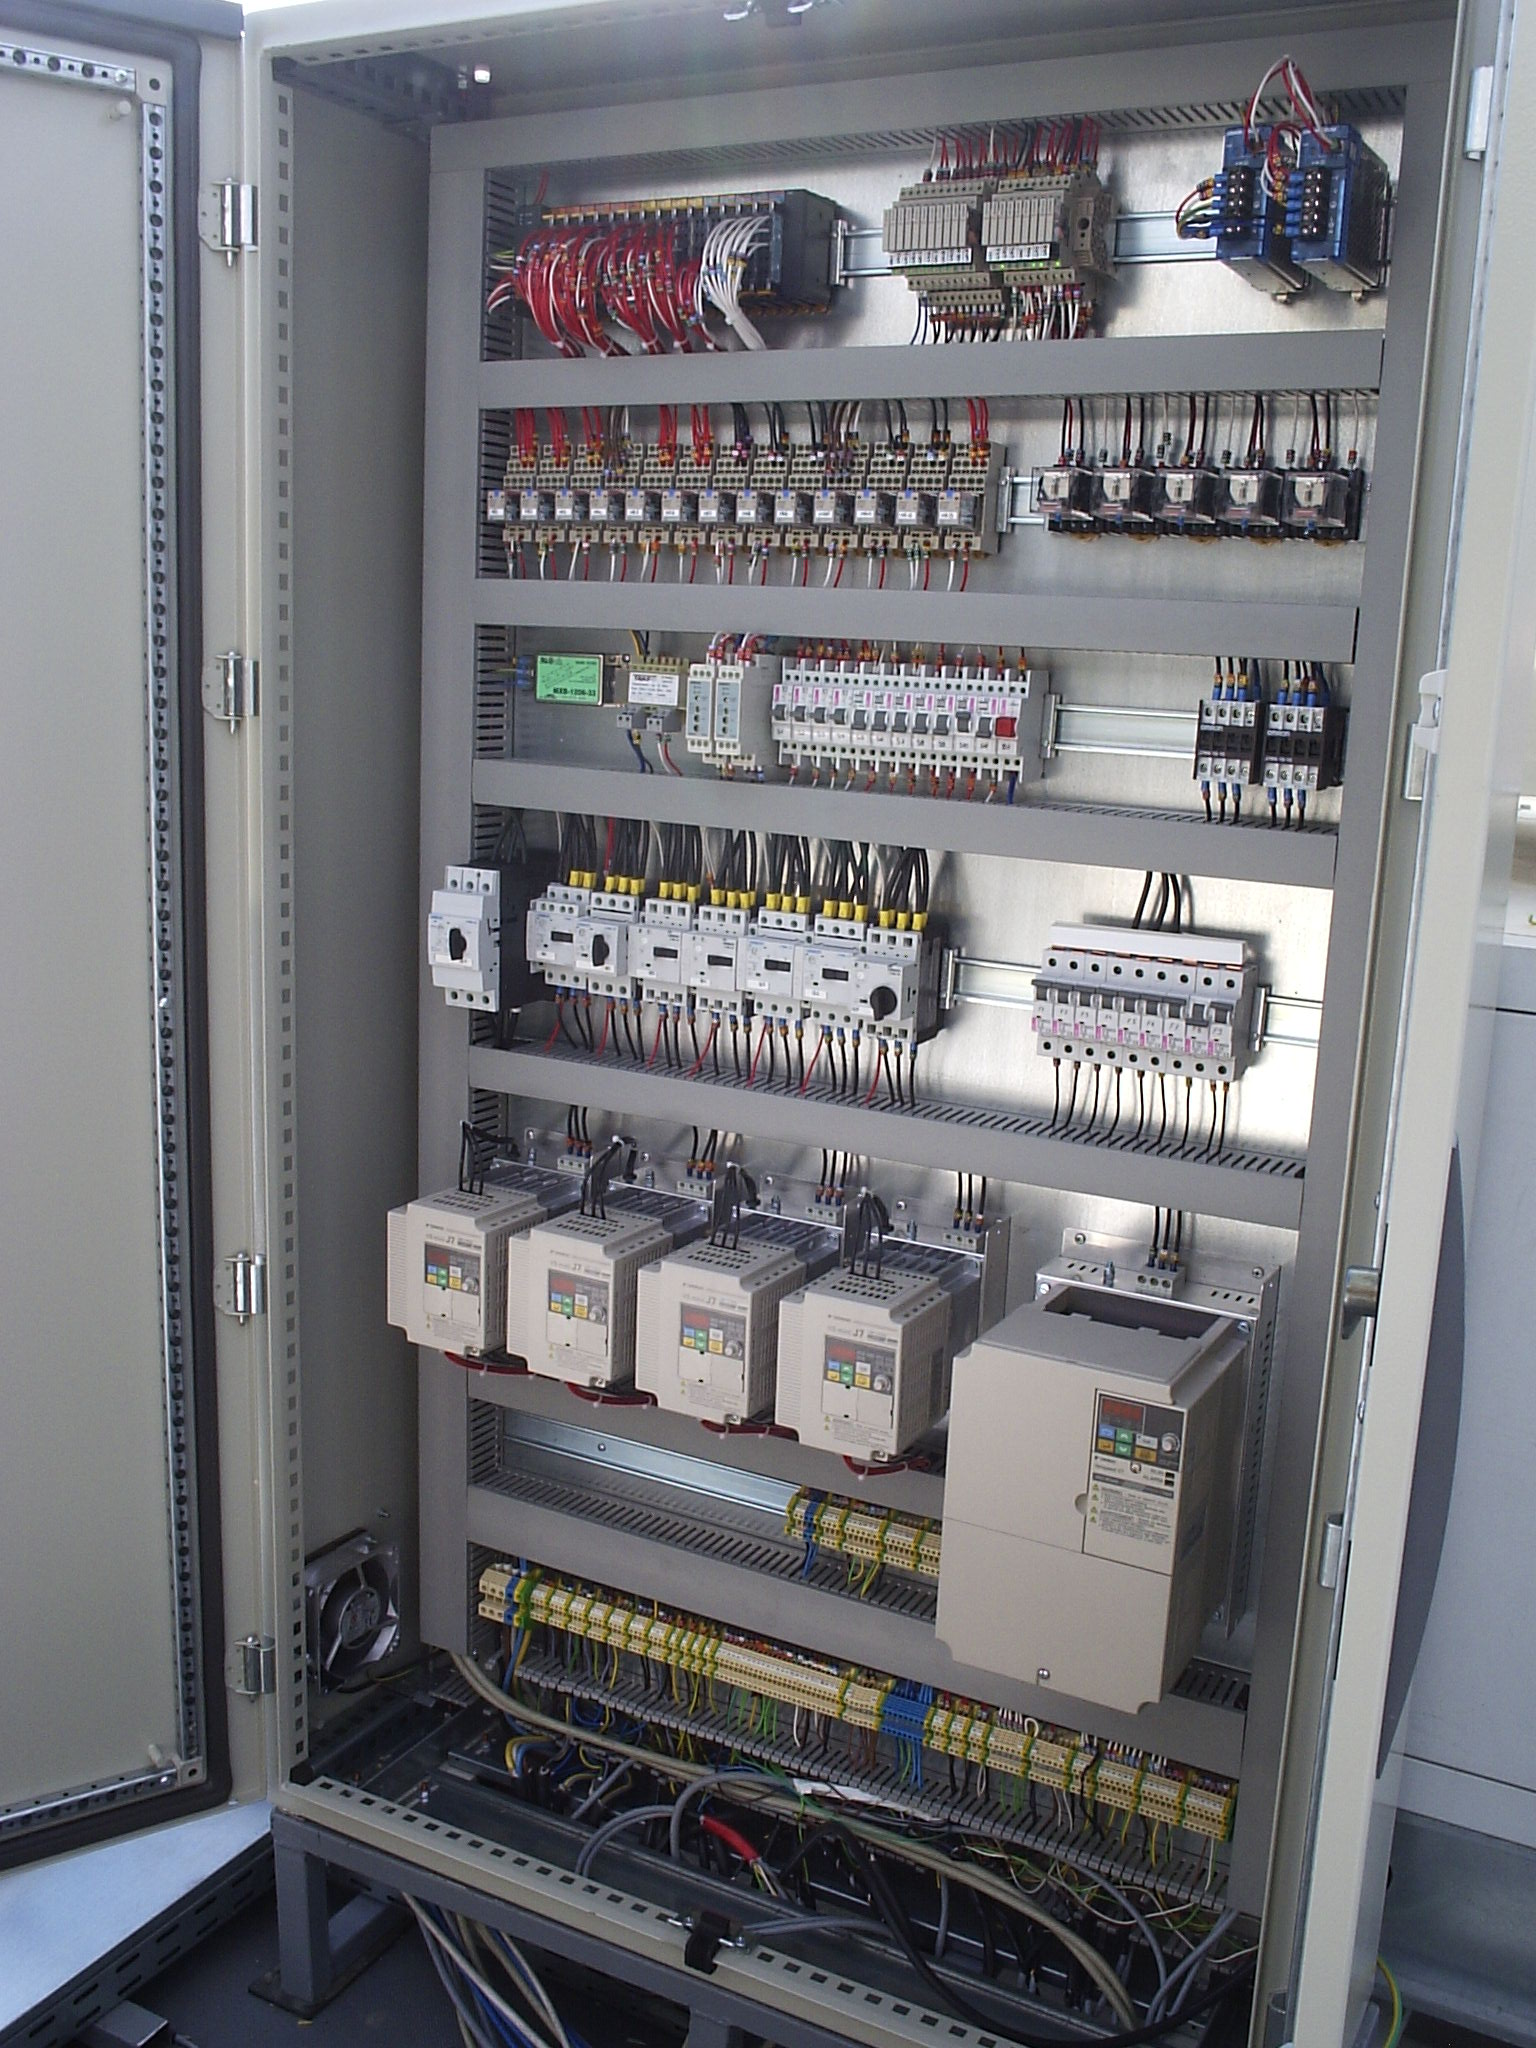 Proizvodnja ormara energetike i automatike